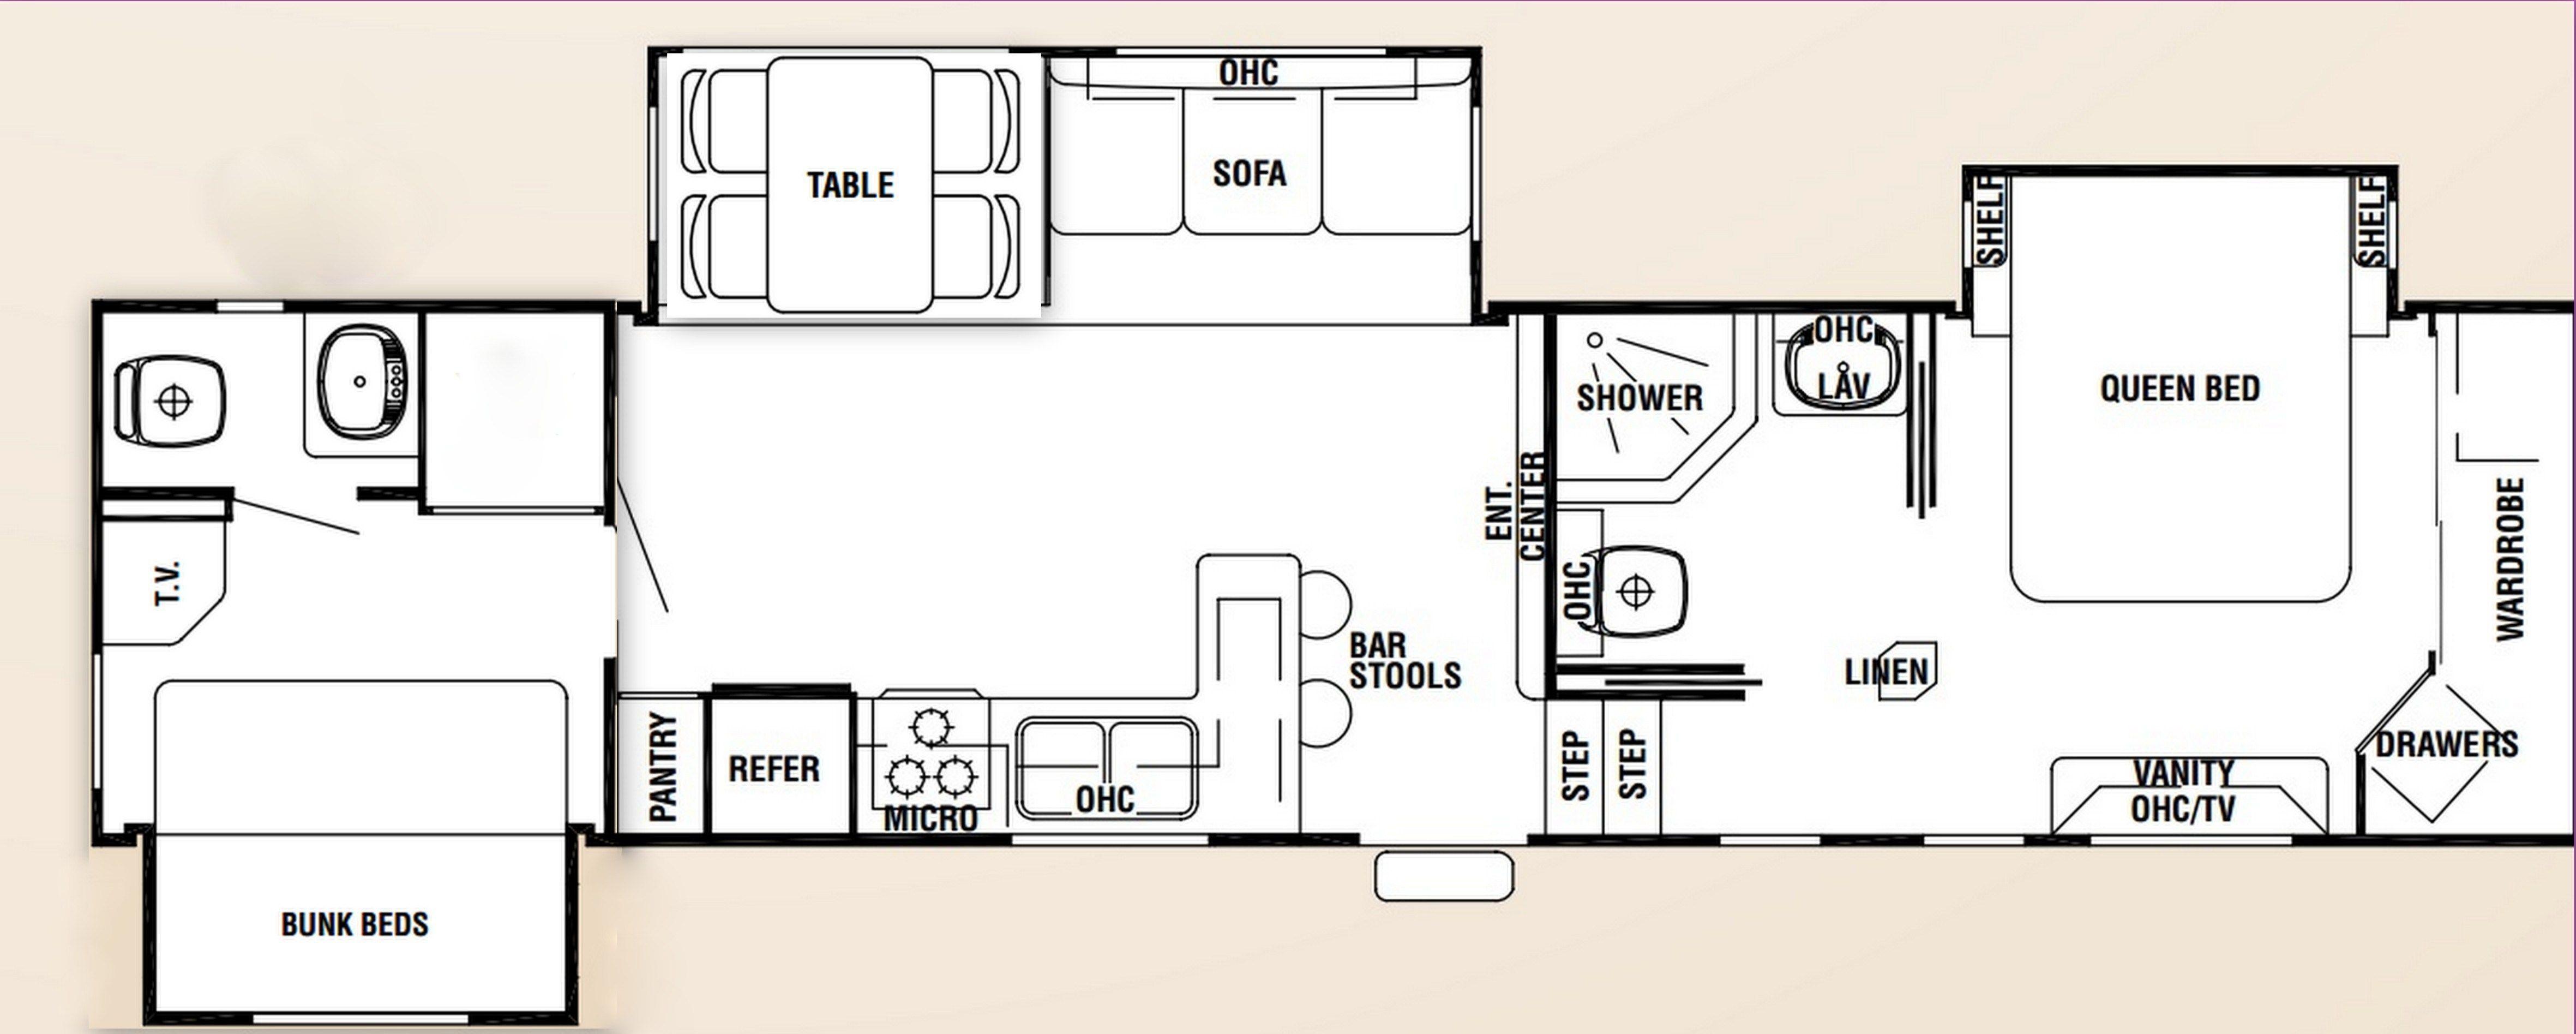 5th Wheel Floor Plans With 2 Bathrooms Rv Floor Plans Floor Plans Master Bedroom Interior Design